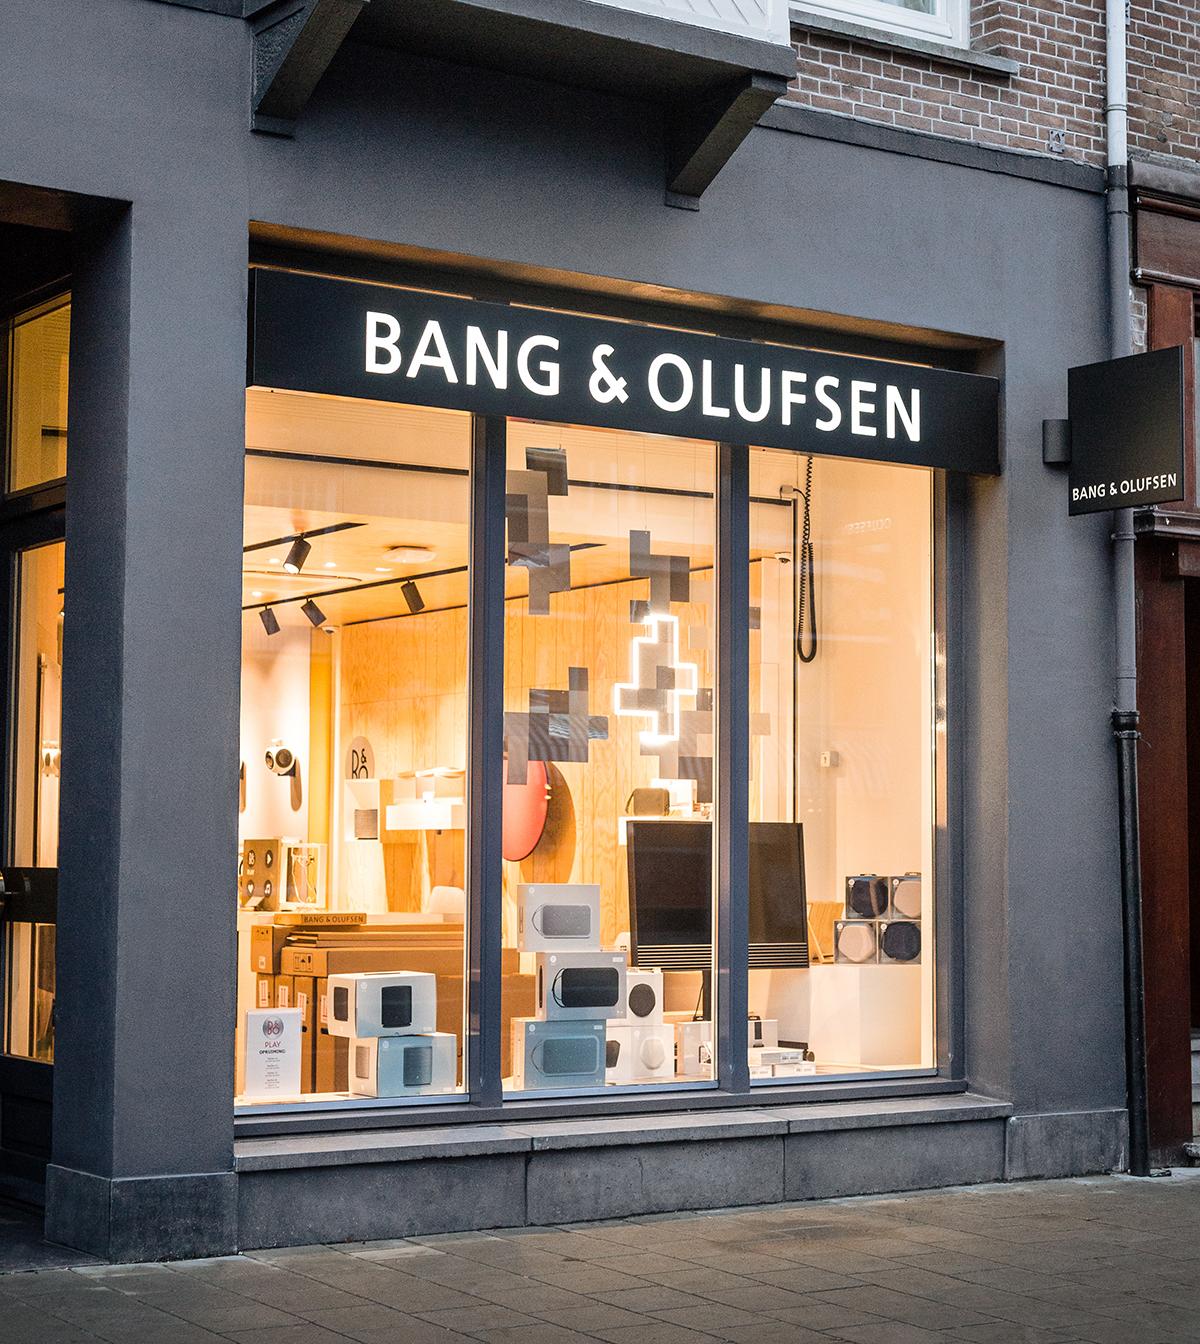 Bang&Olufsen_DavienFotografie-13_crop.jpg